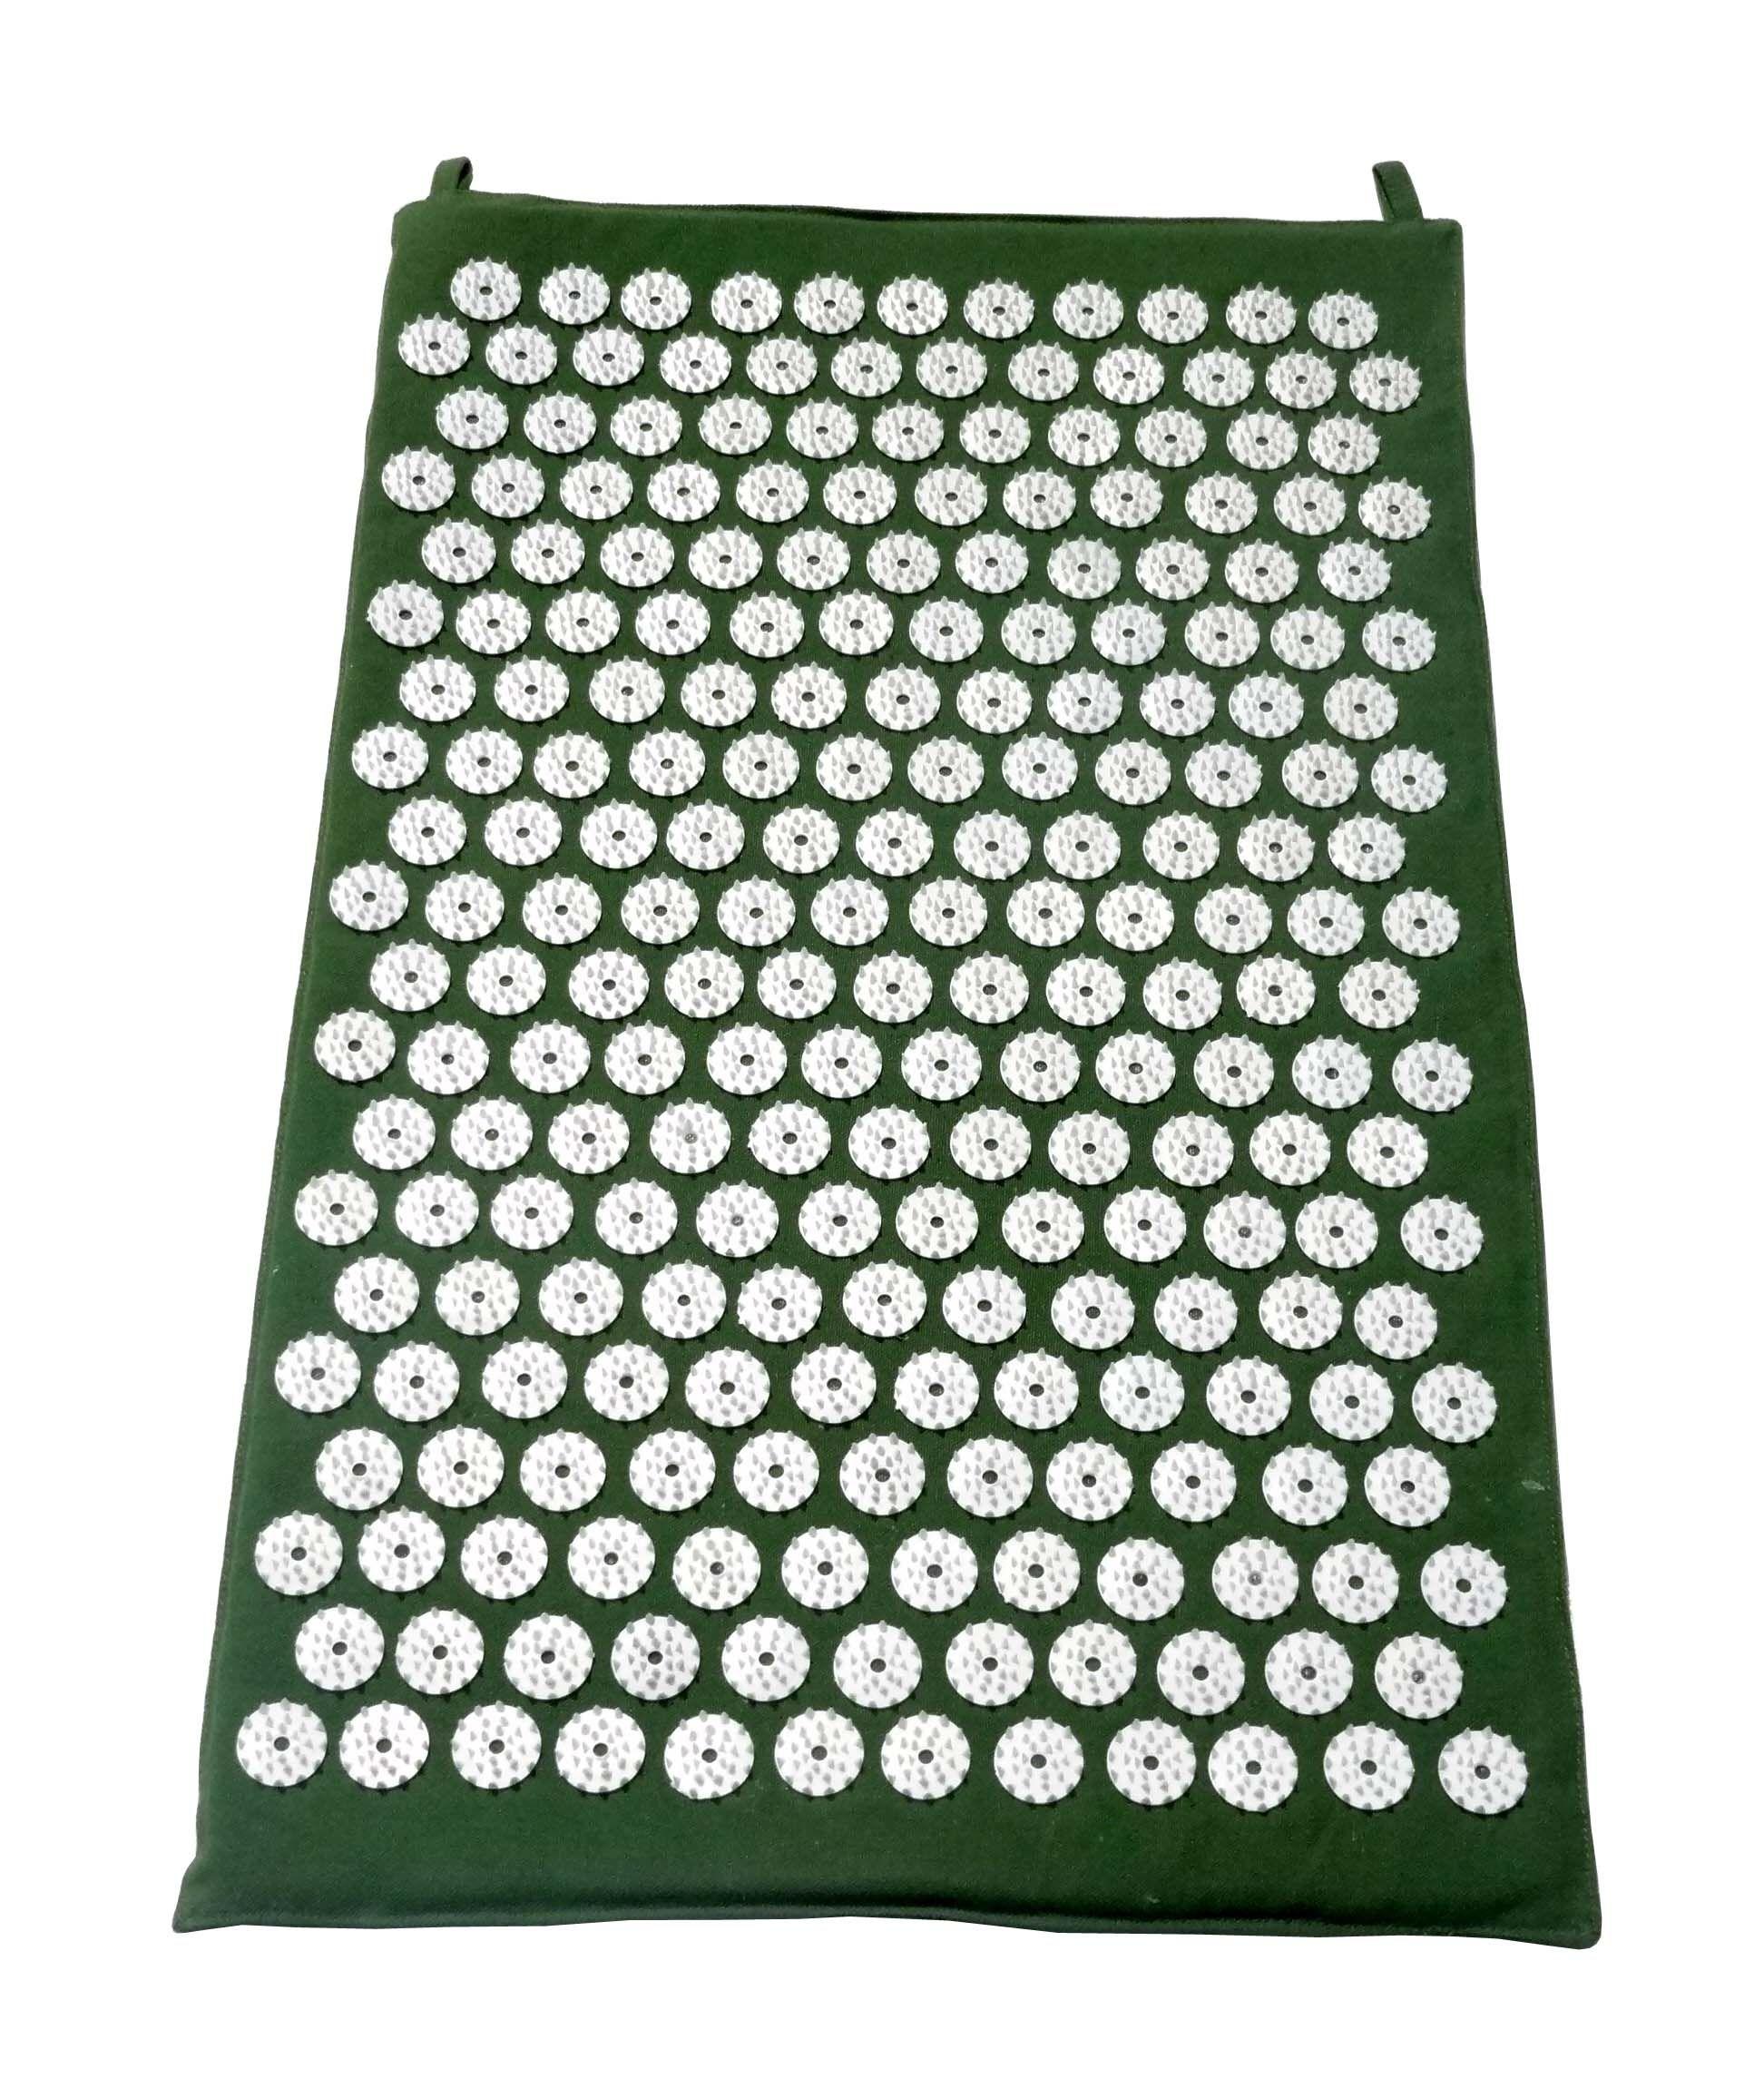 Gravolite Best Acupressuremats Light Weight Easy To Carry Click On Below Link Http Www Matsindia Com Portfol Buy Yoga Mat Acupressure Mat Mat Exercises